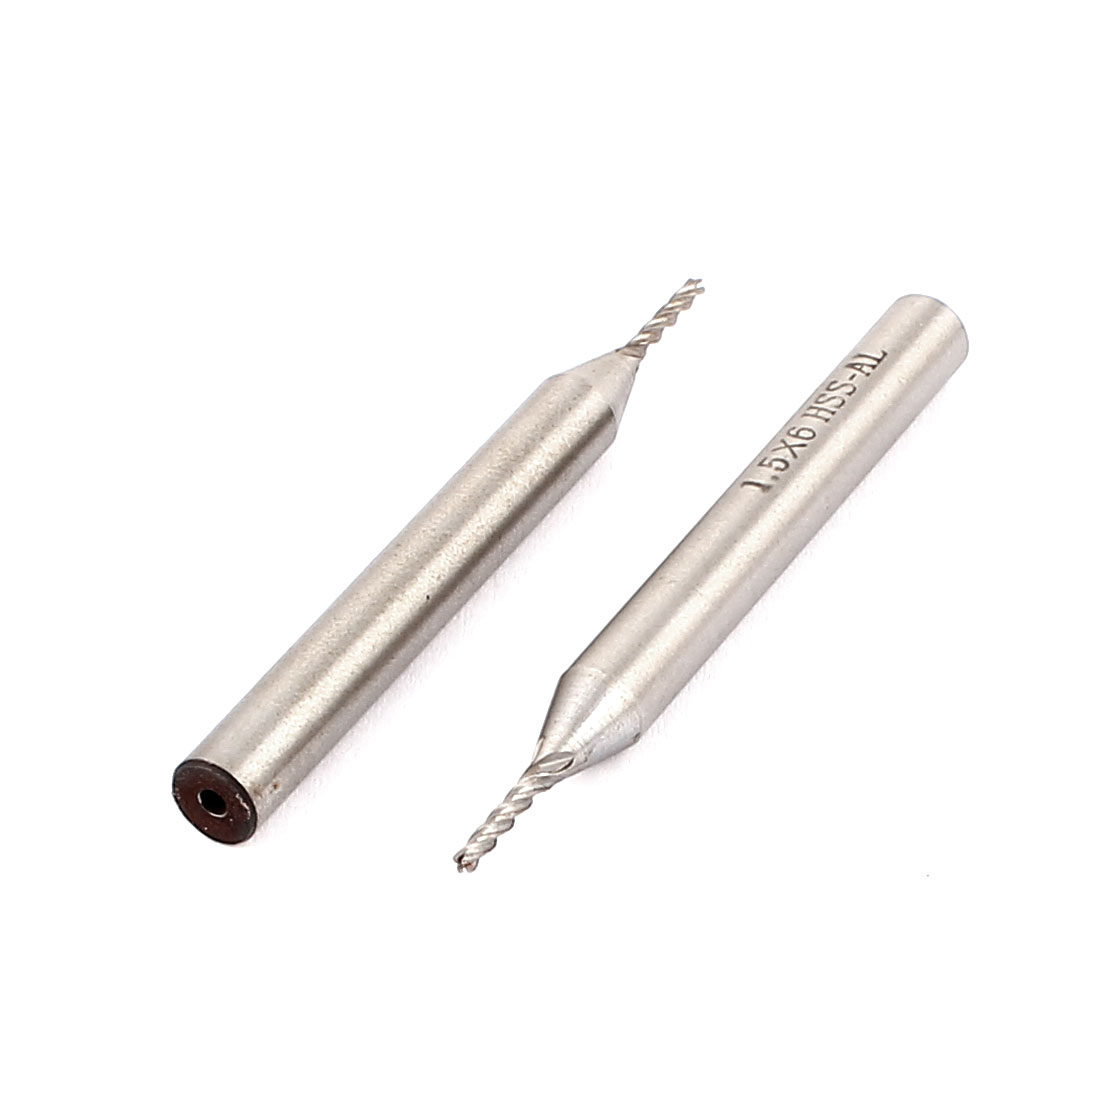 1.5mm Cutting Dia 6mm Straight Shank 4 Flute HSSAL End Mill Cutter CNC Bit 2Pcs